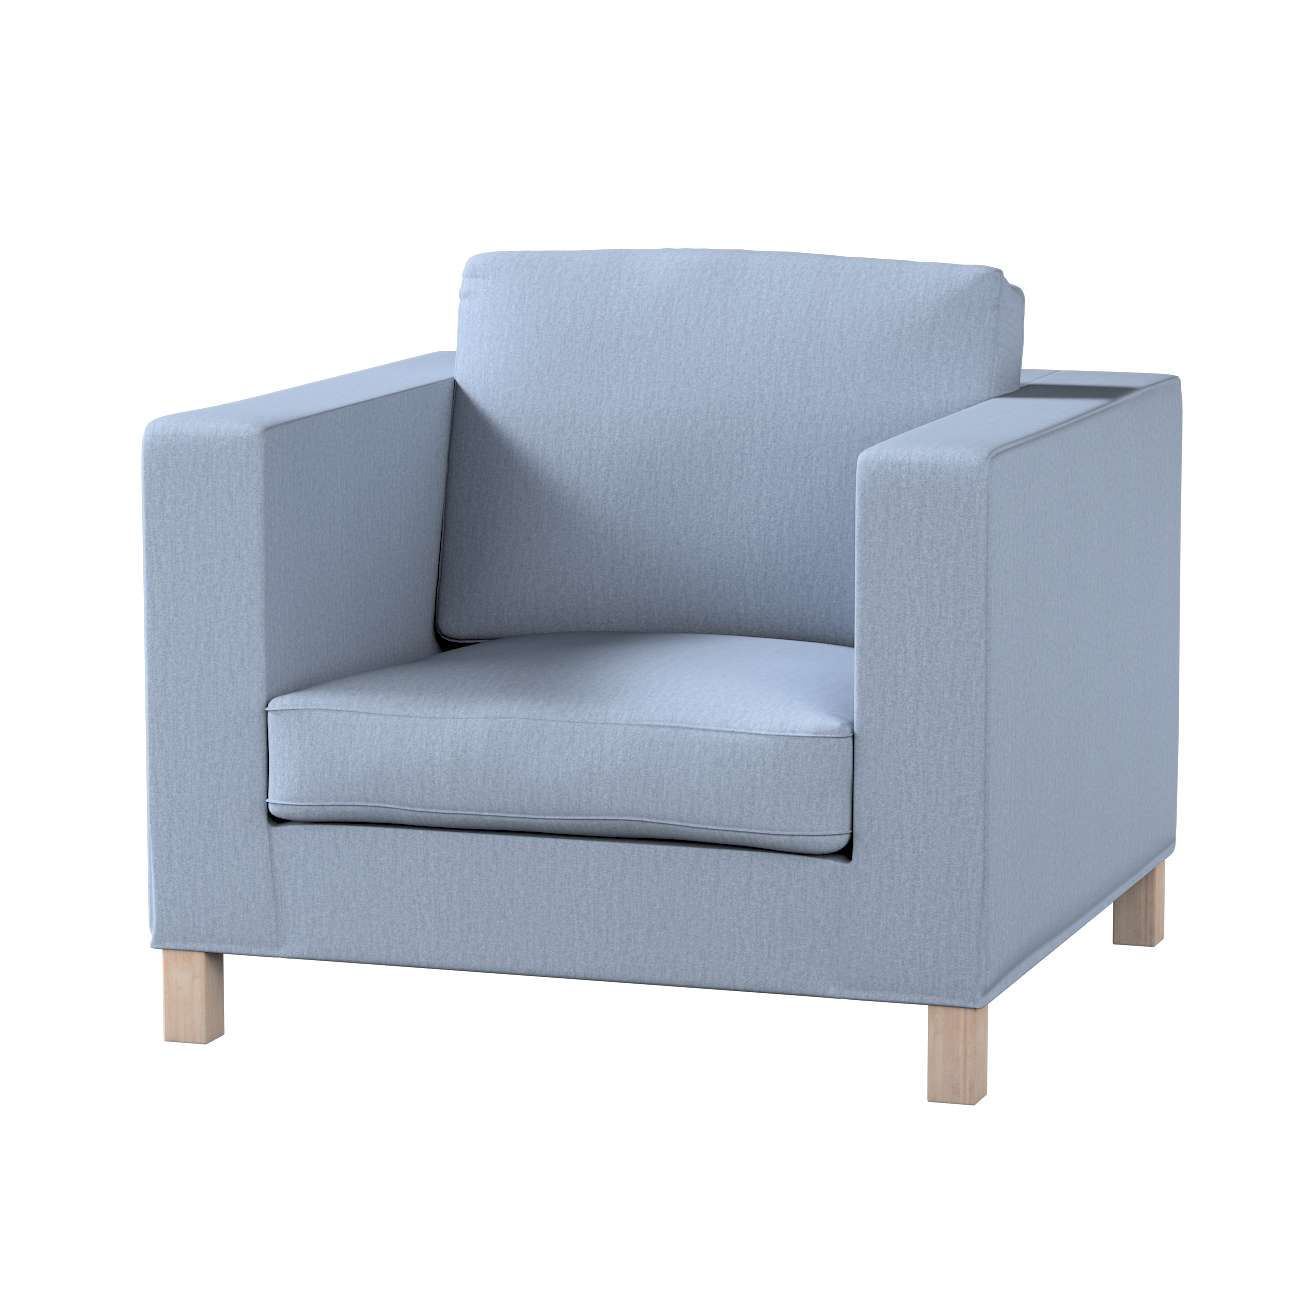 Pokrowiec na fotel Karlanda, krótki fotel Karlanda w kolekcji Chenille, tkanina: 702-13